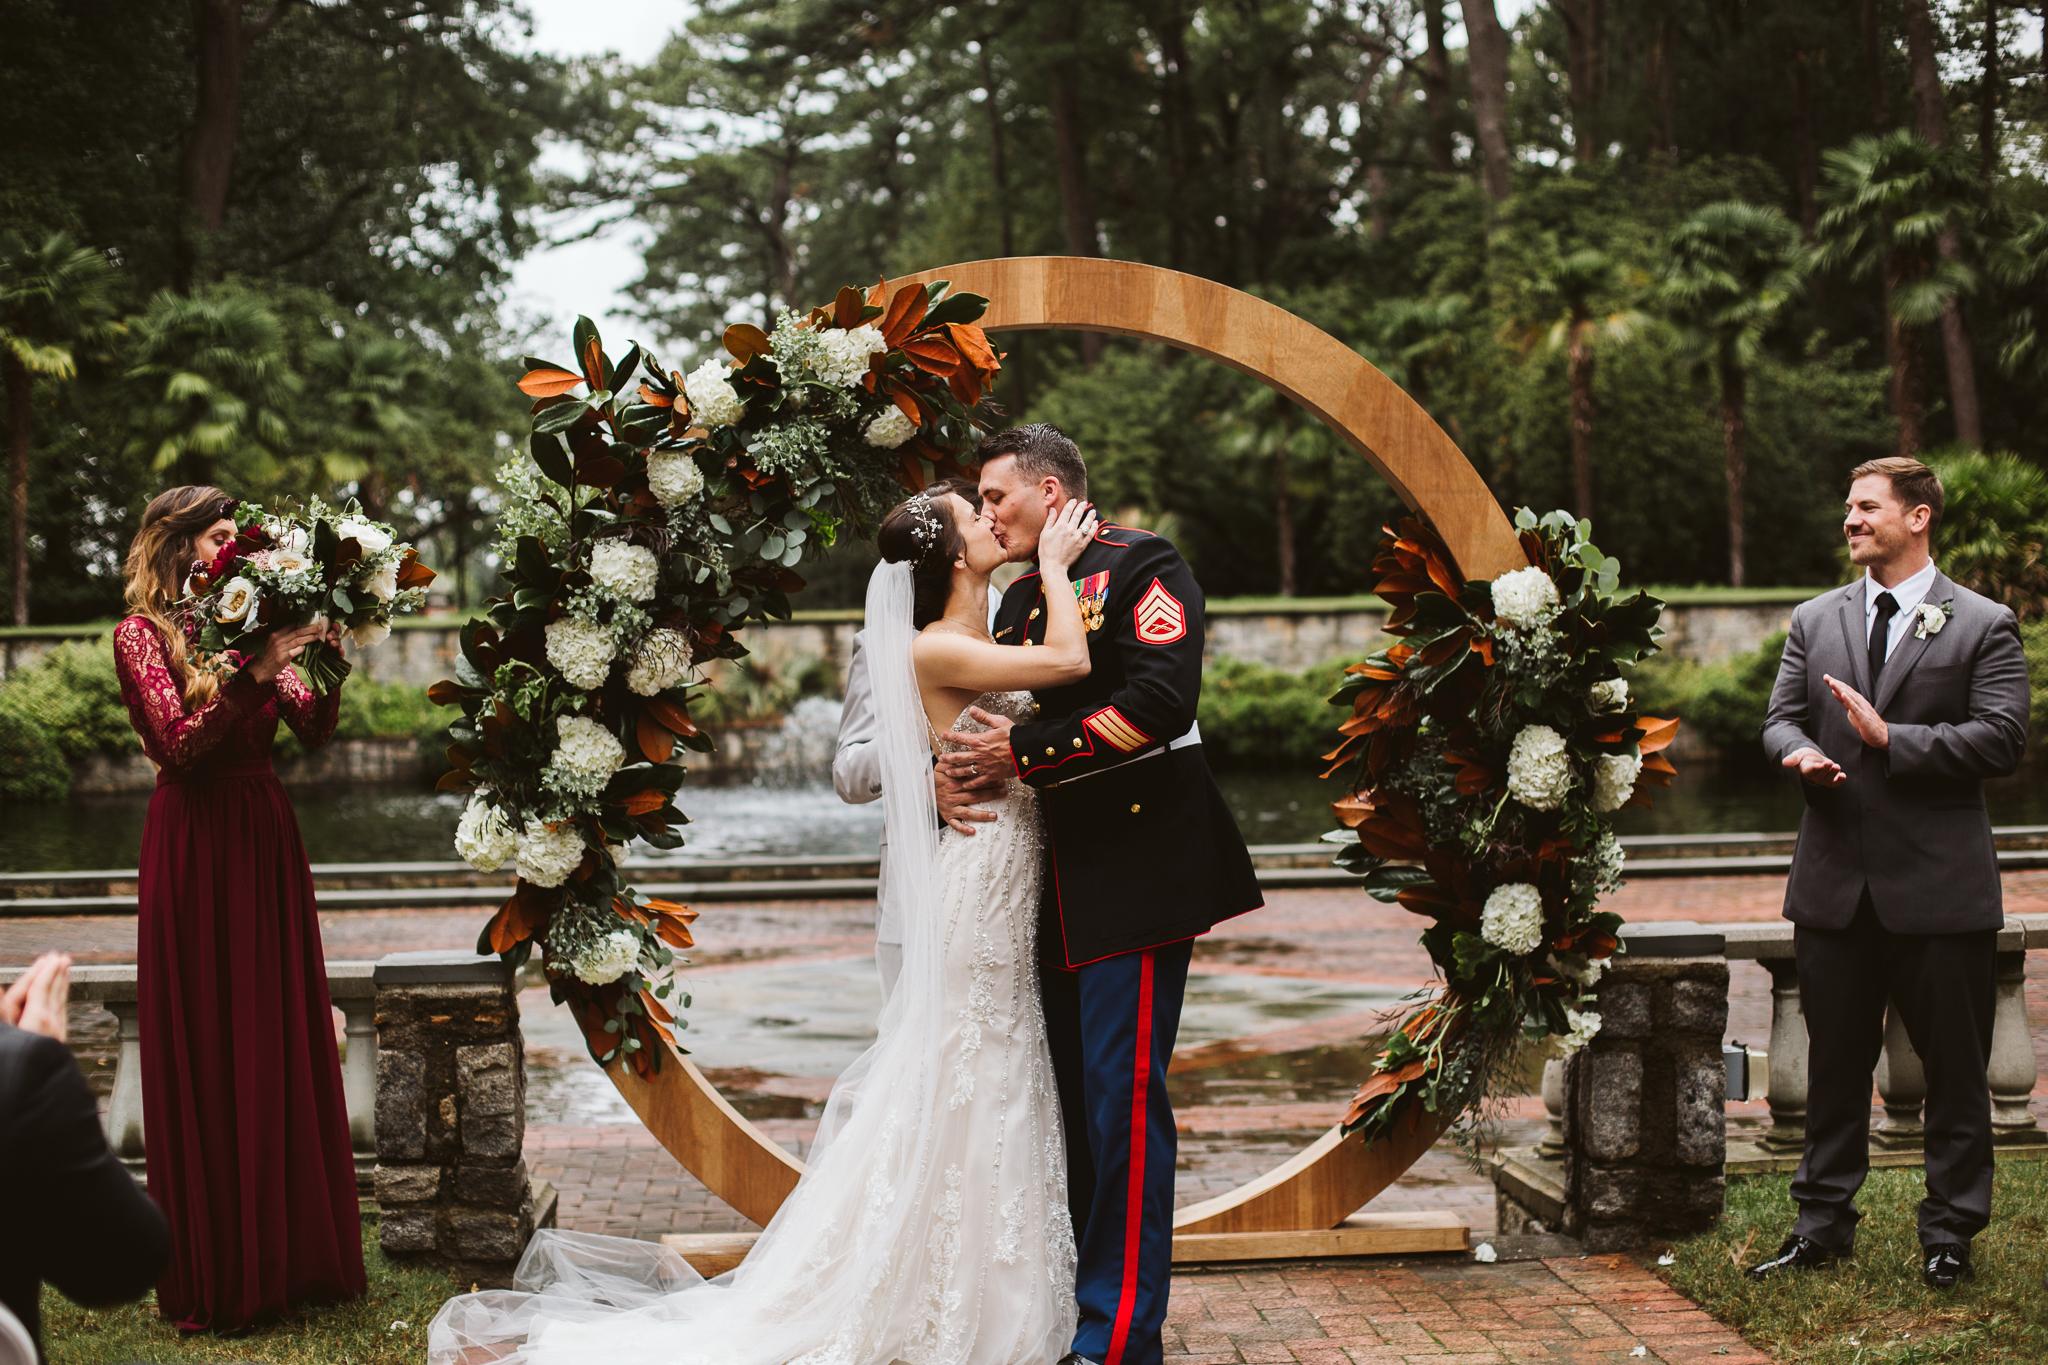 hamptonroads_wedding_norfolk_botanical_gardens-55.JPG